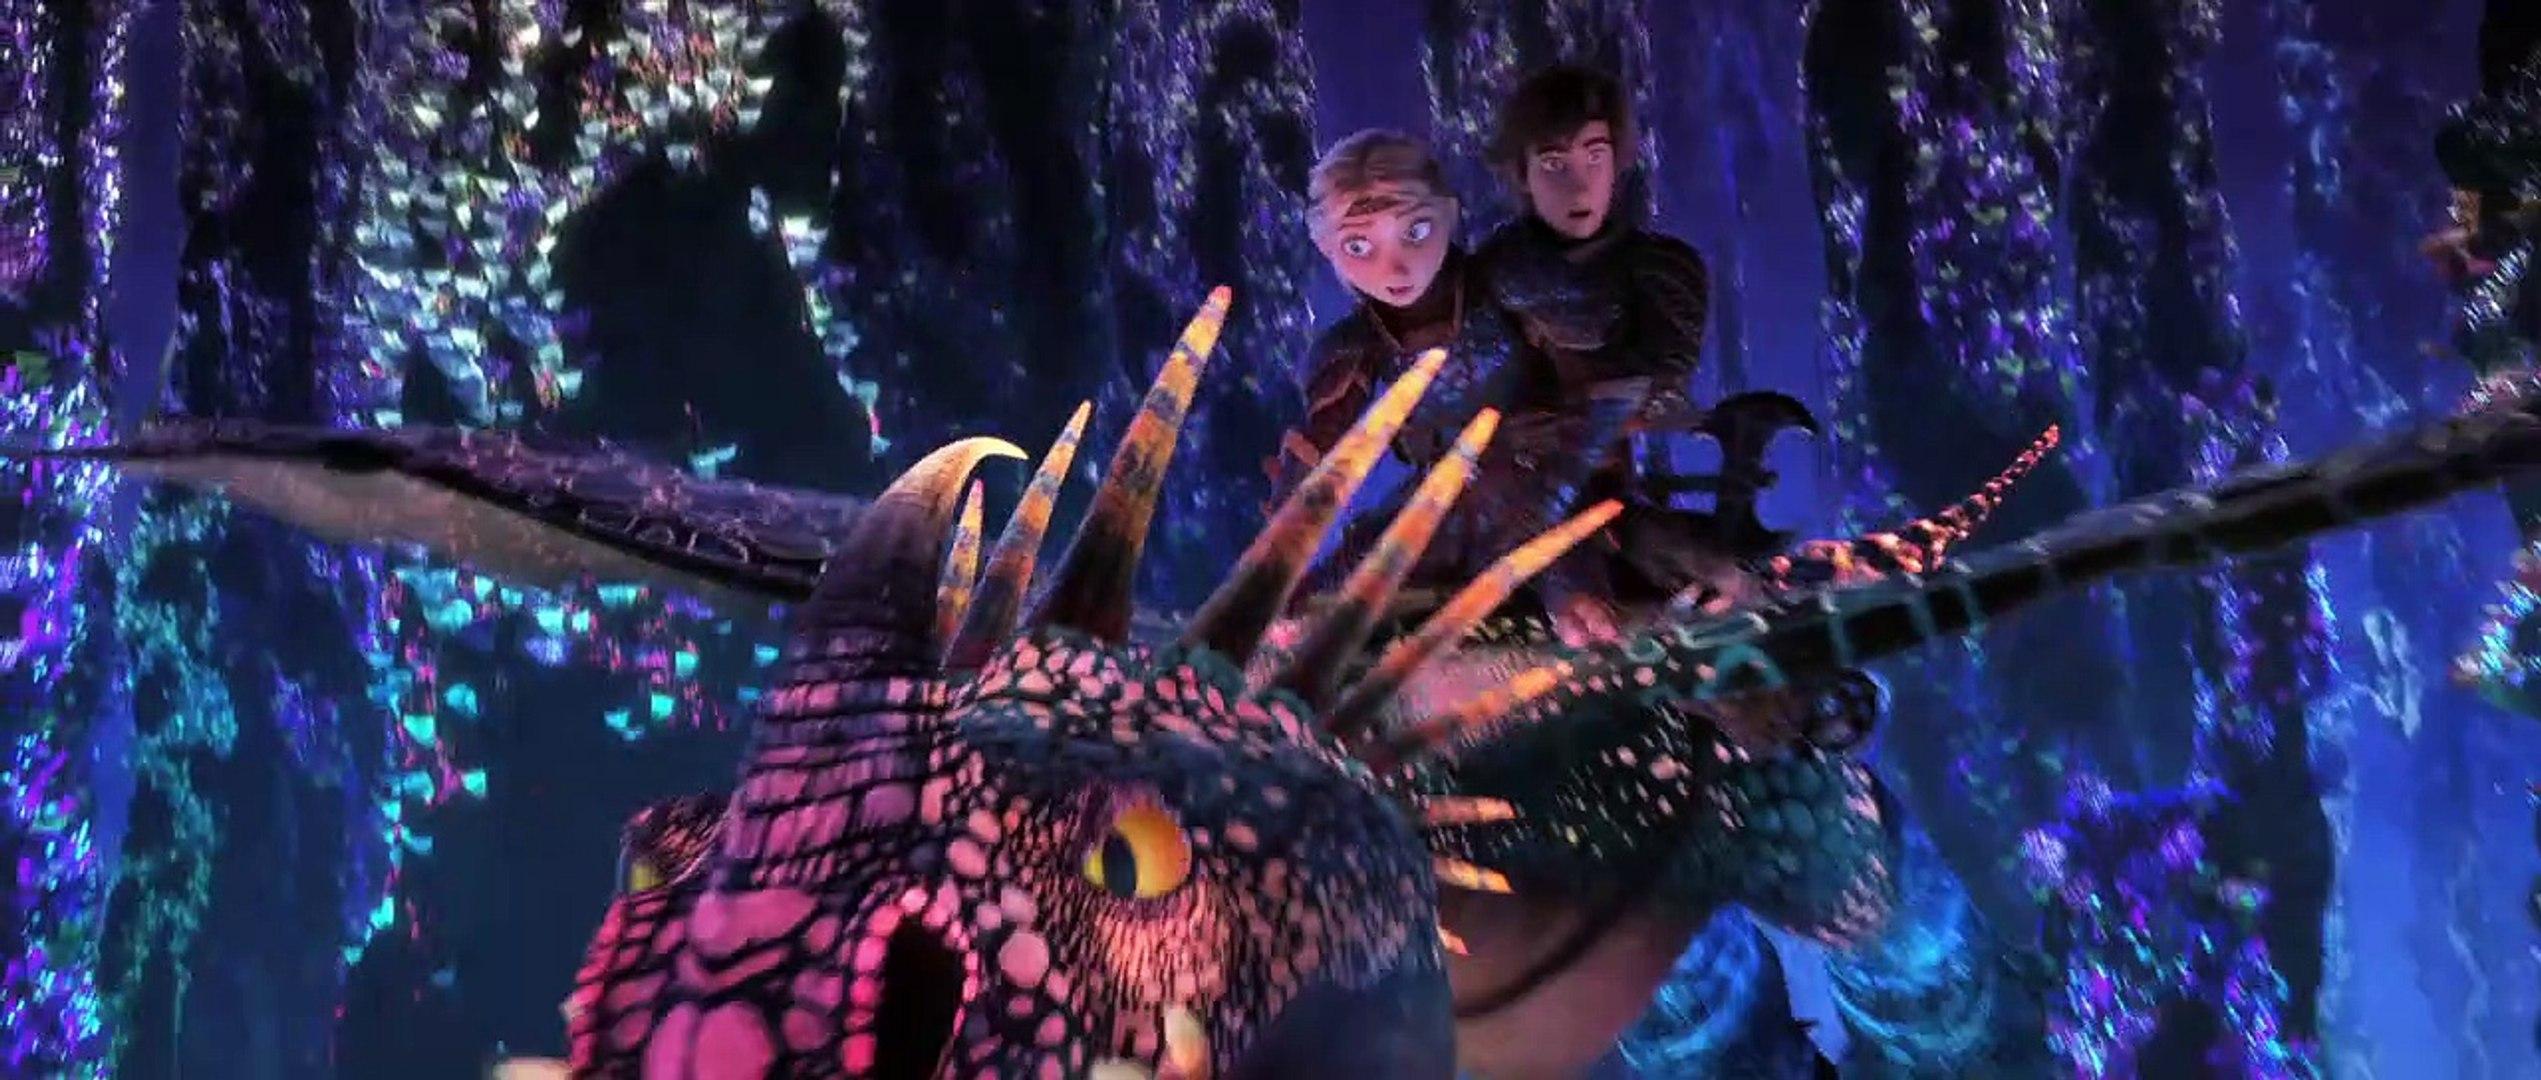 How to Train Your Dragon 3 Harold et Krokmou monde caché Movie Figure 2019